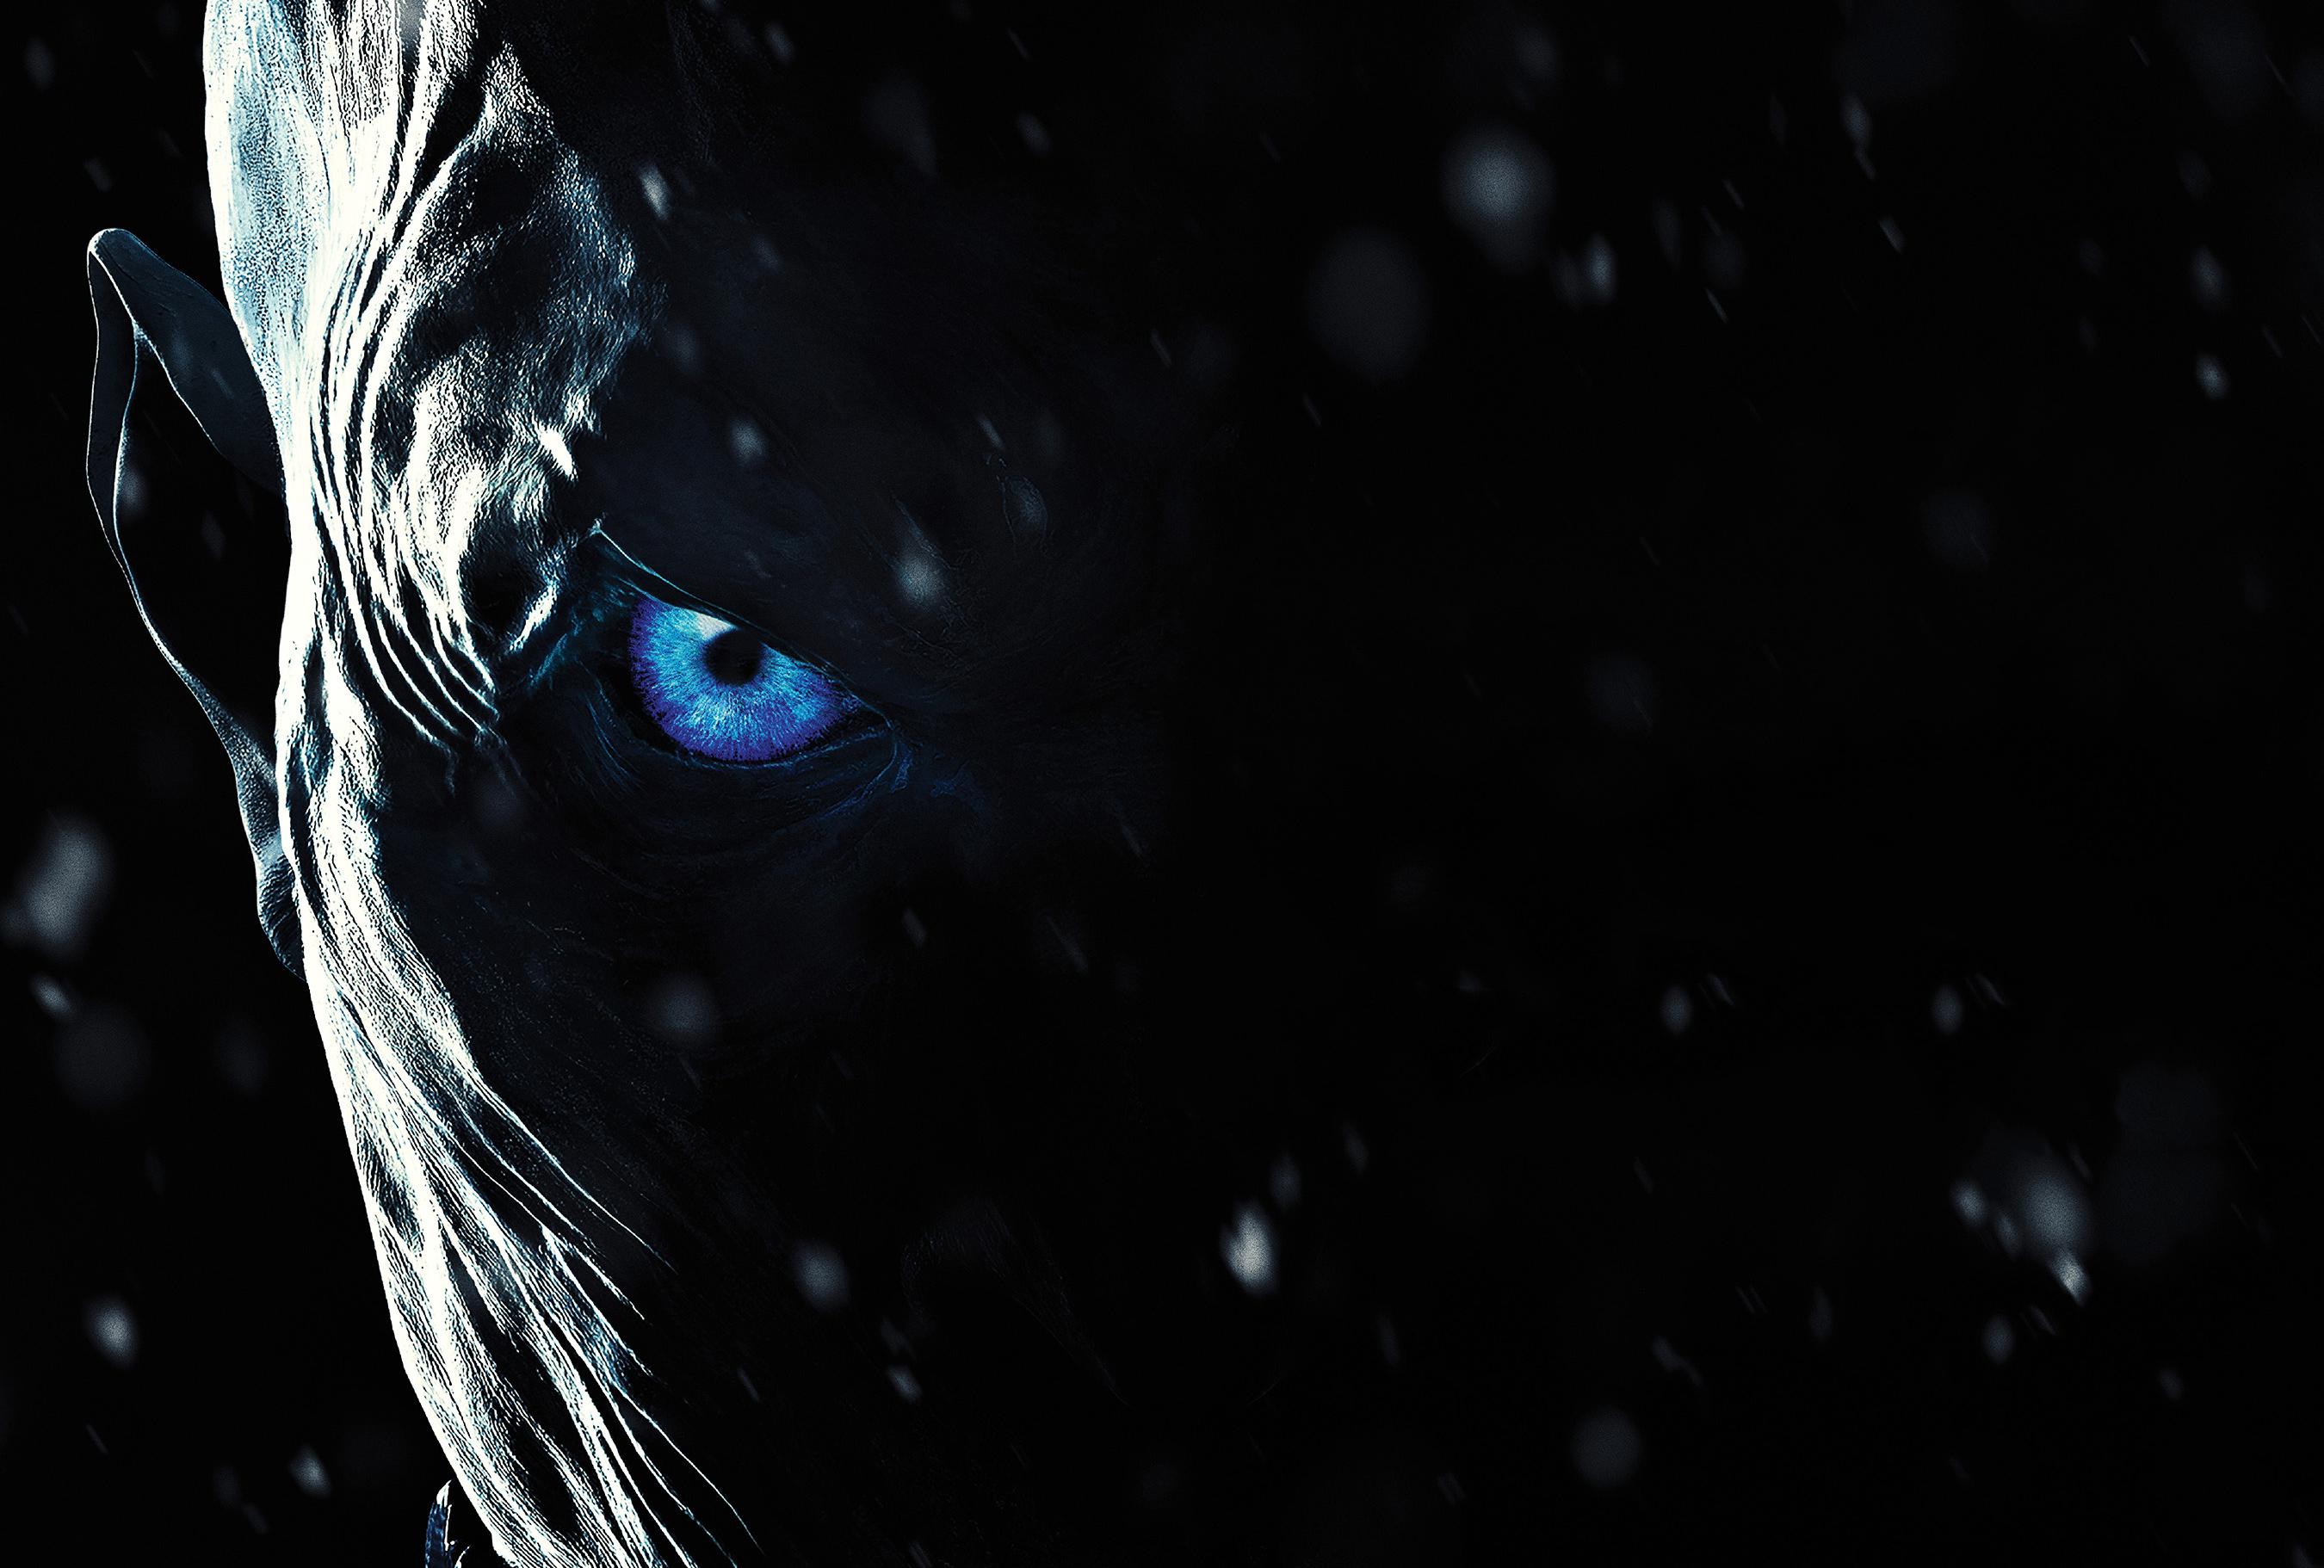 game of thrones season 7 white walkers tv shows hd 4k